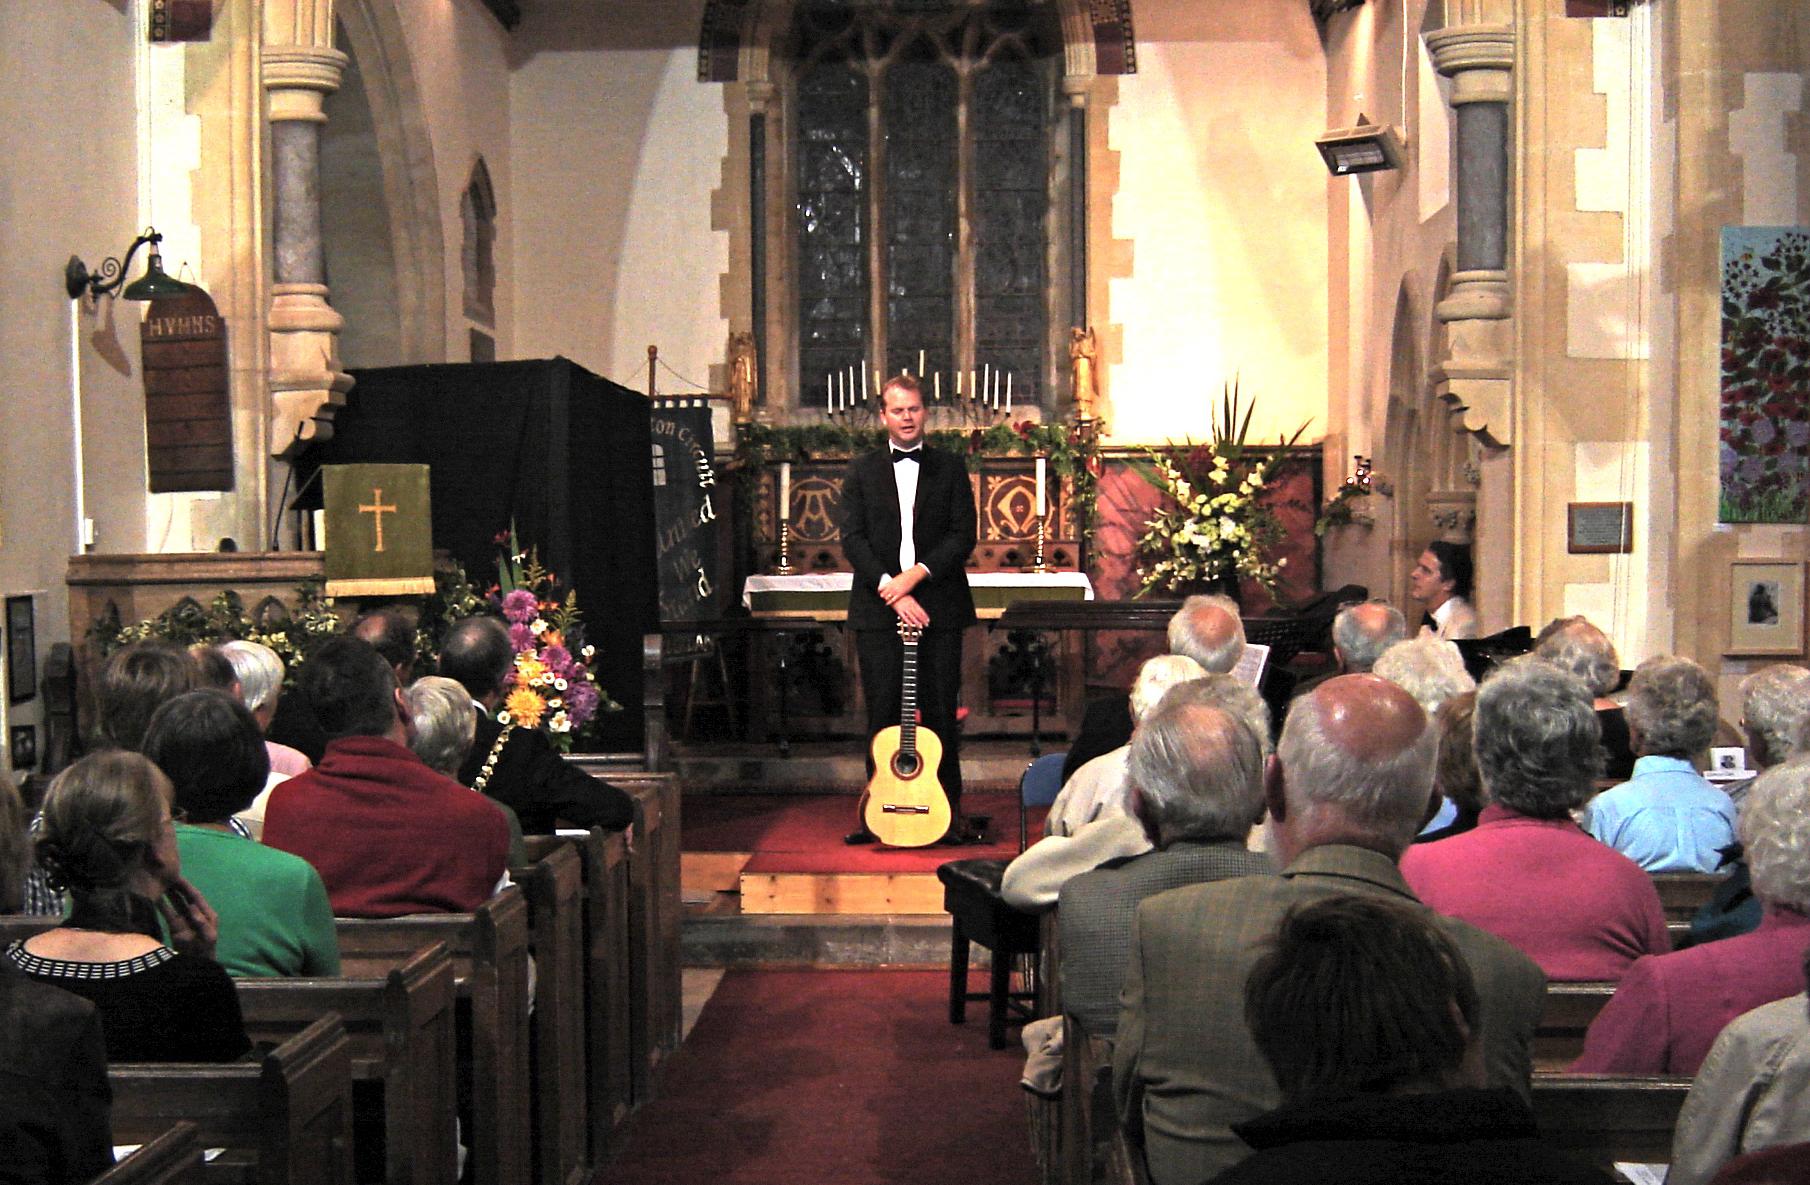 Jon Pickard on stage in concert